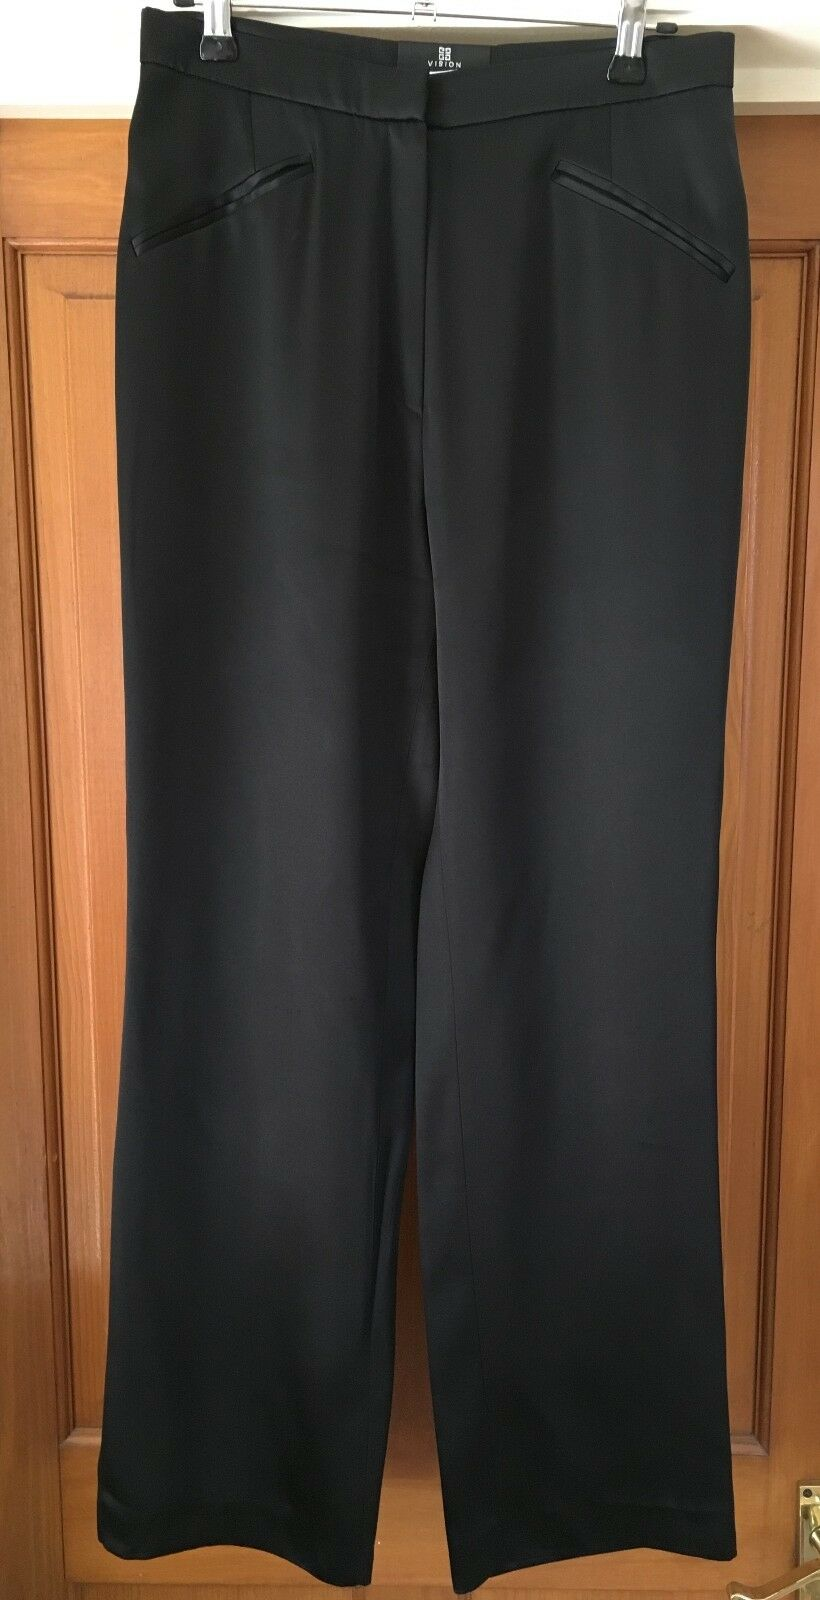 Givenchy Donna Nero in Raso Festa Pantaloni Pantaloni Taglia 40